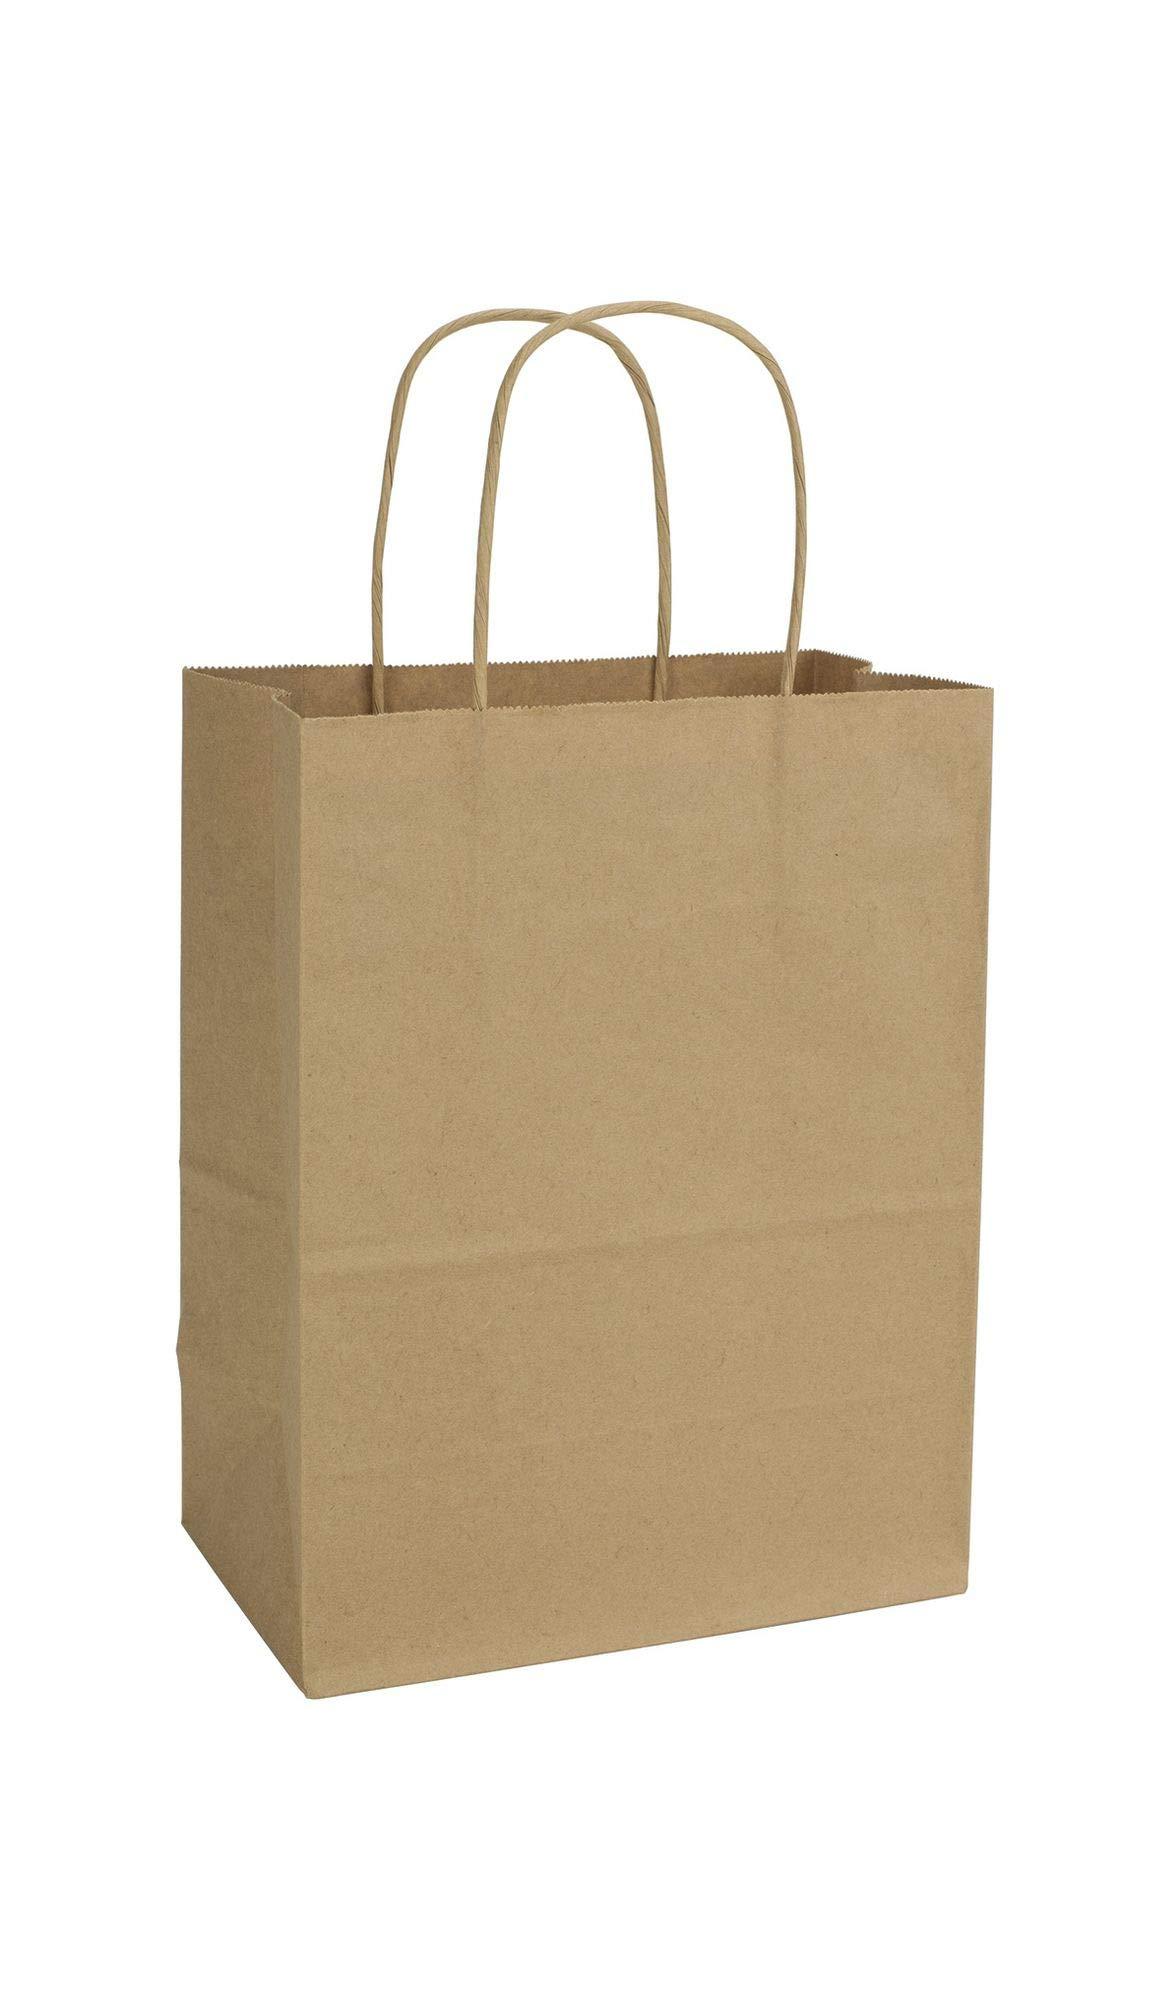 Kraft Paper Shoppers Cub, 8 1/4 x 4 1/4 x 10 3/4'' (250 Bags) - BOWS-15-8